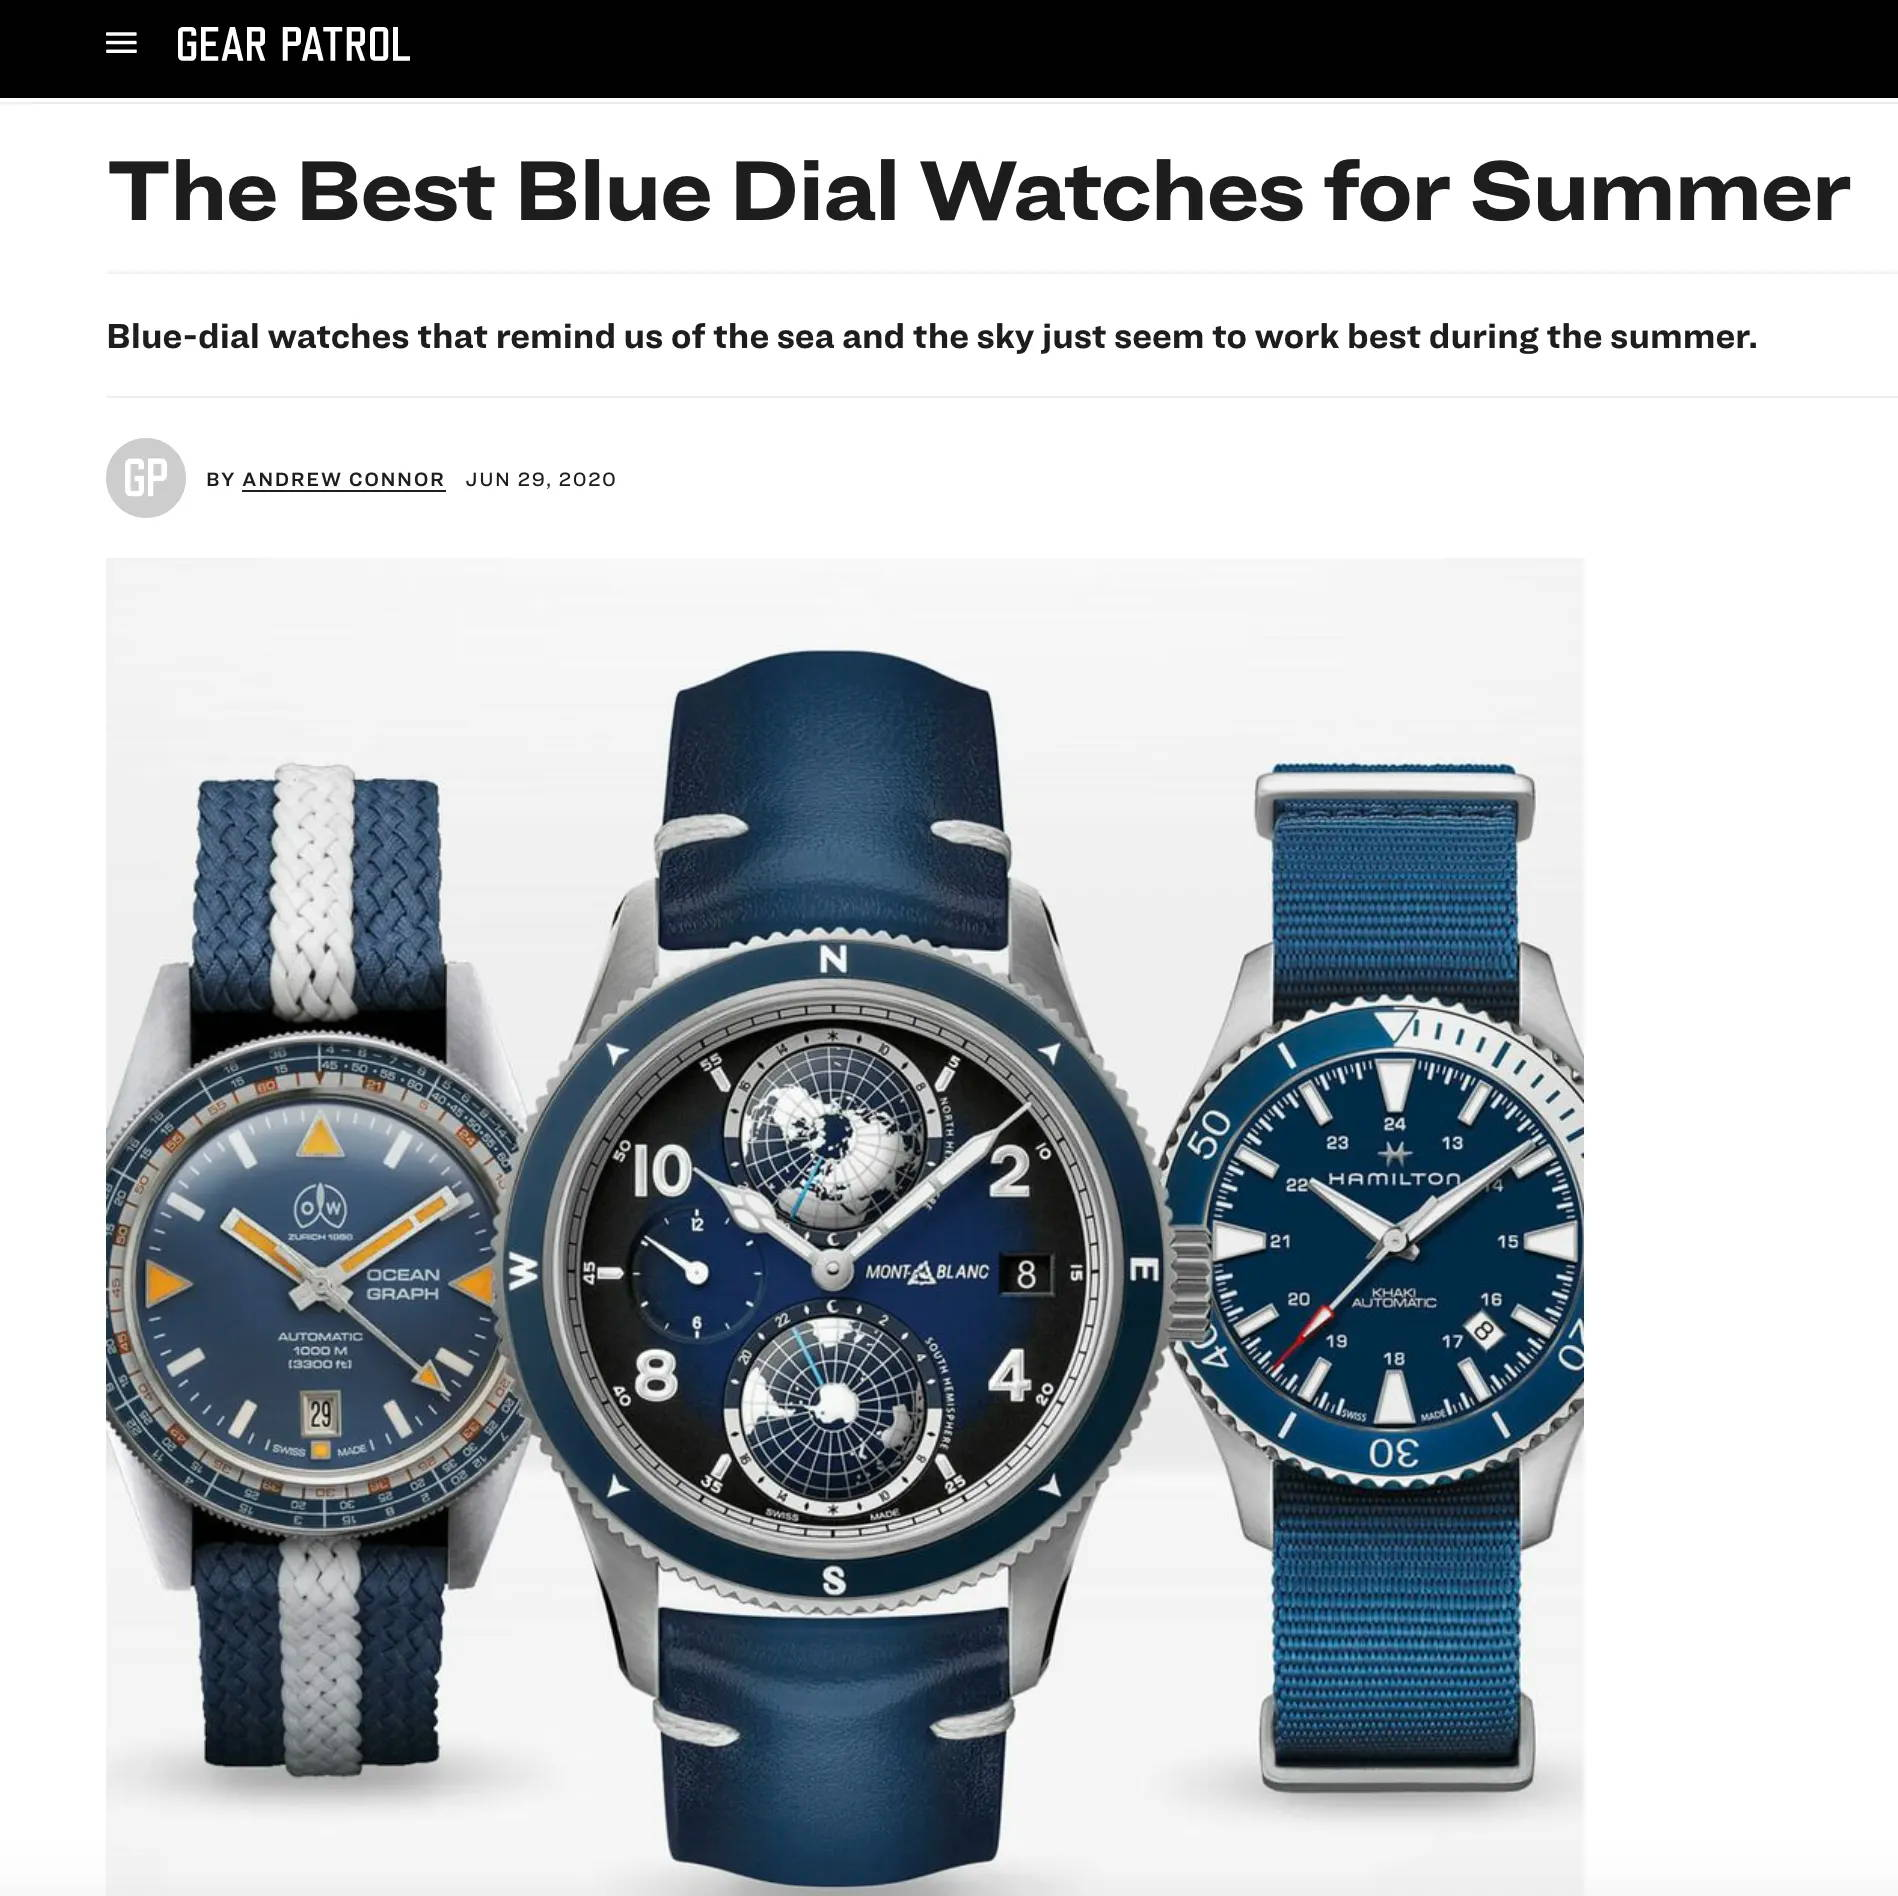 ollech and wajs ocean graph gear patrol The Best Blue Dial Watches for Summer